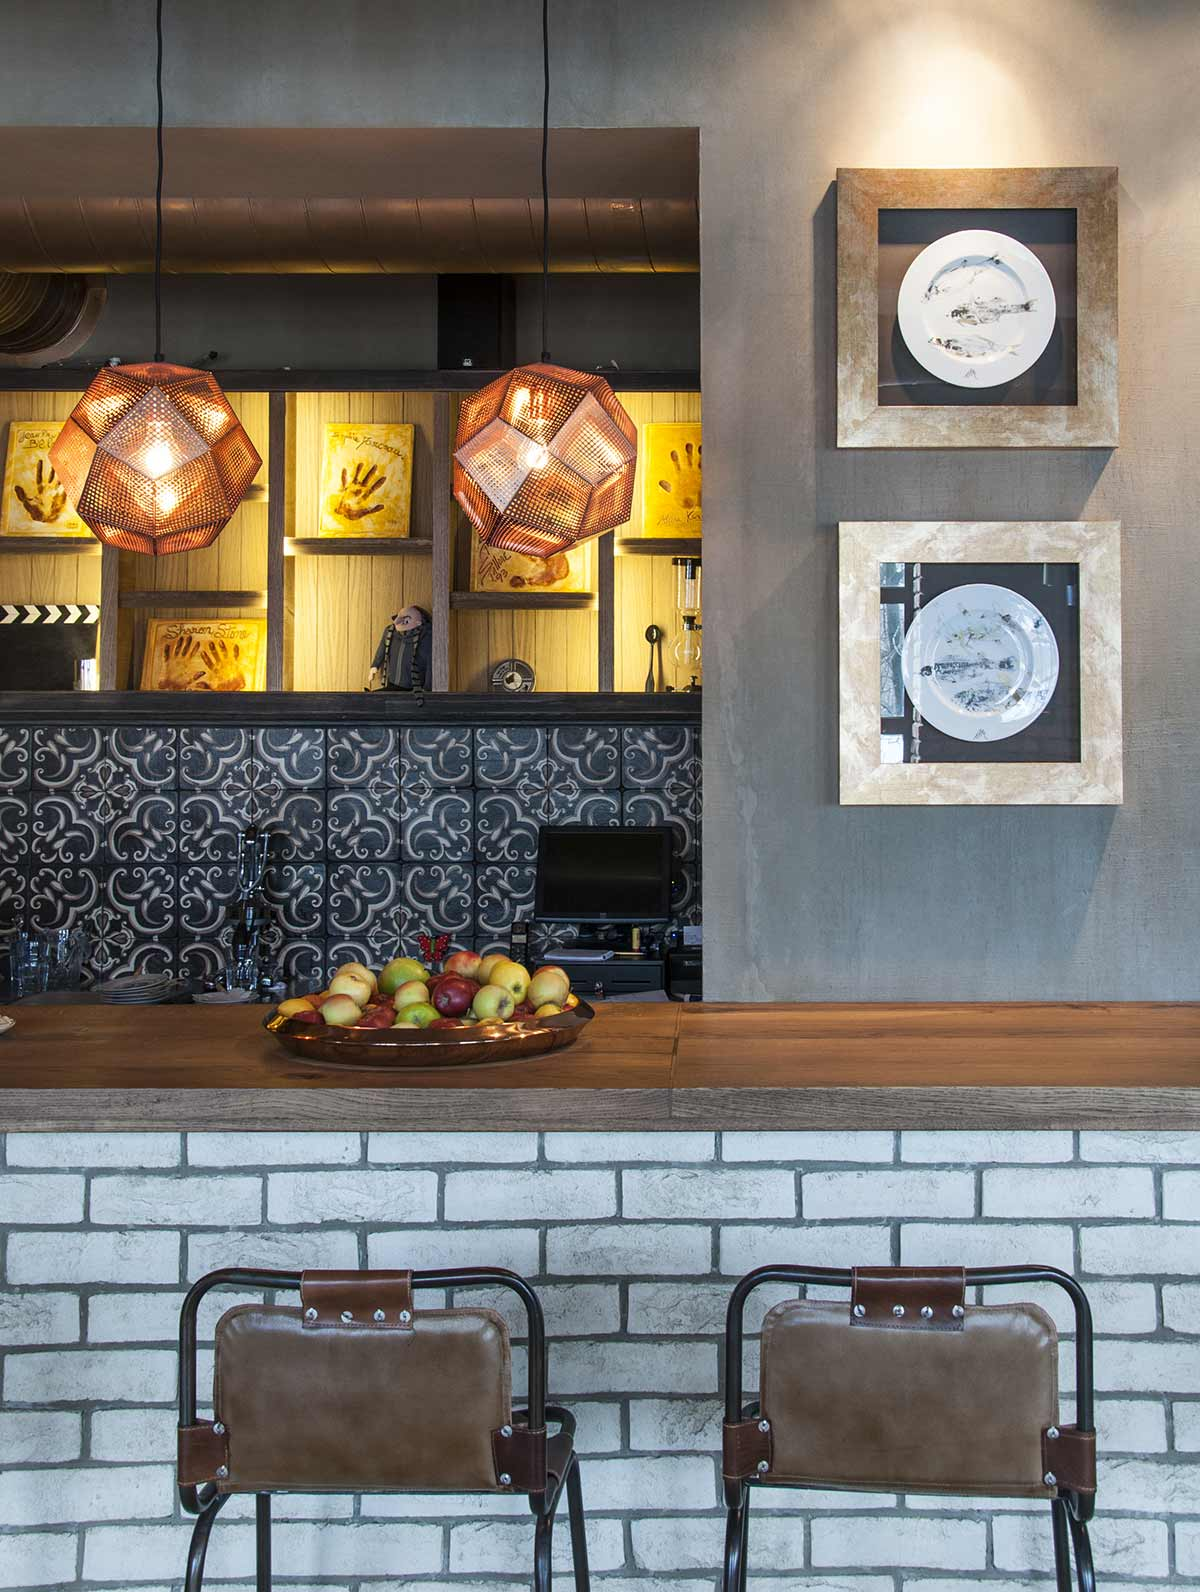 Taburetes Rive para barras de bar en restaurantes.